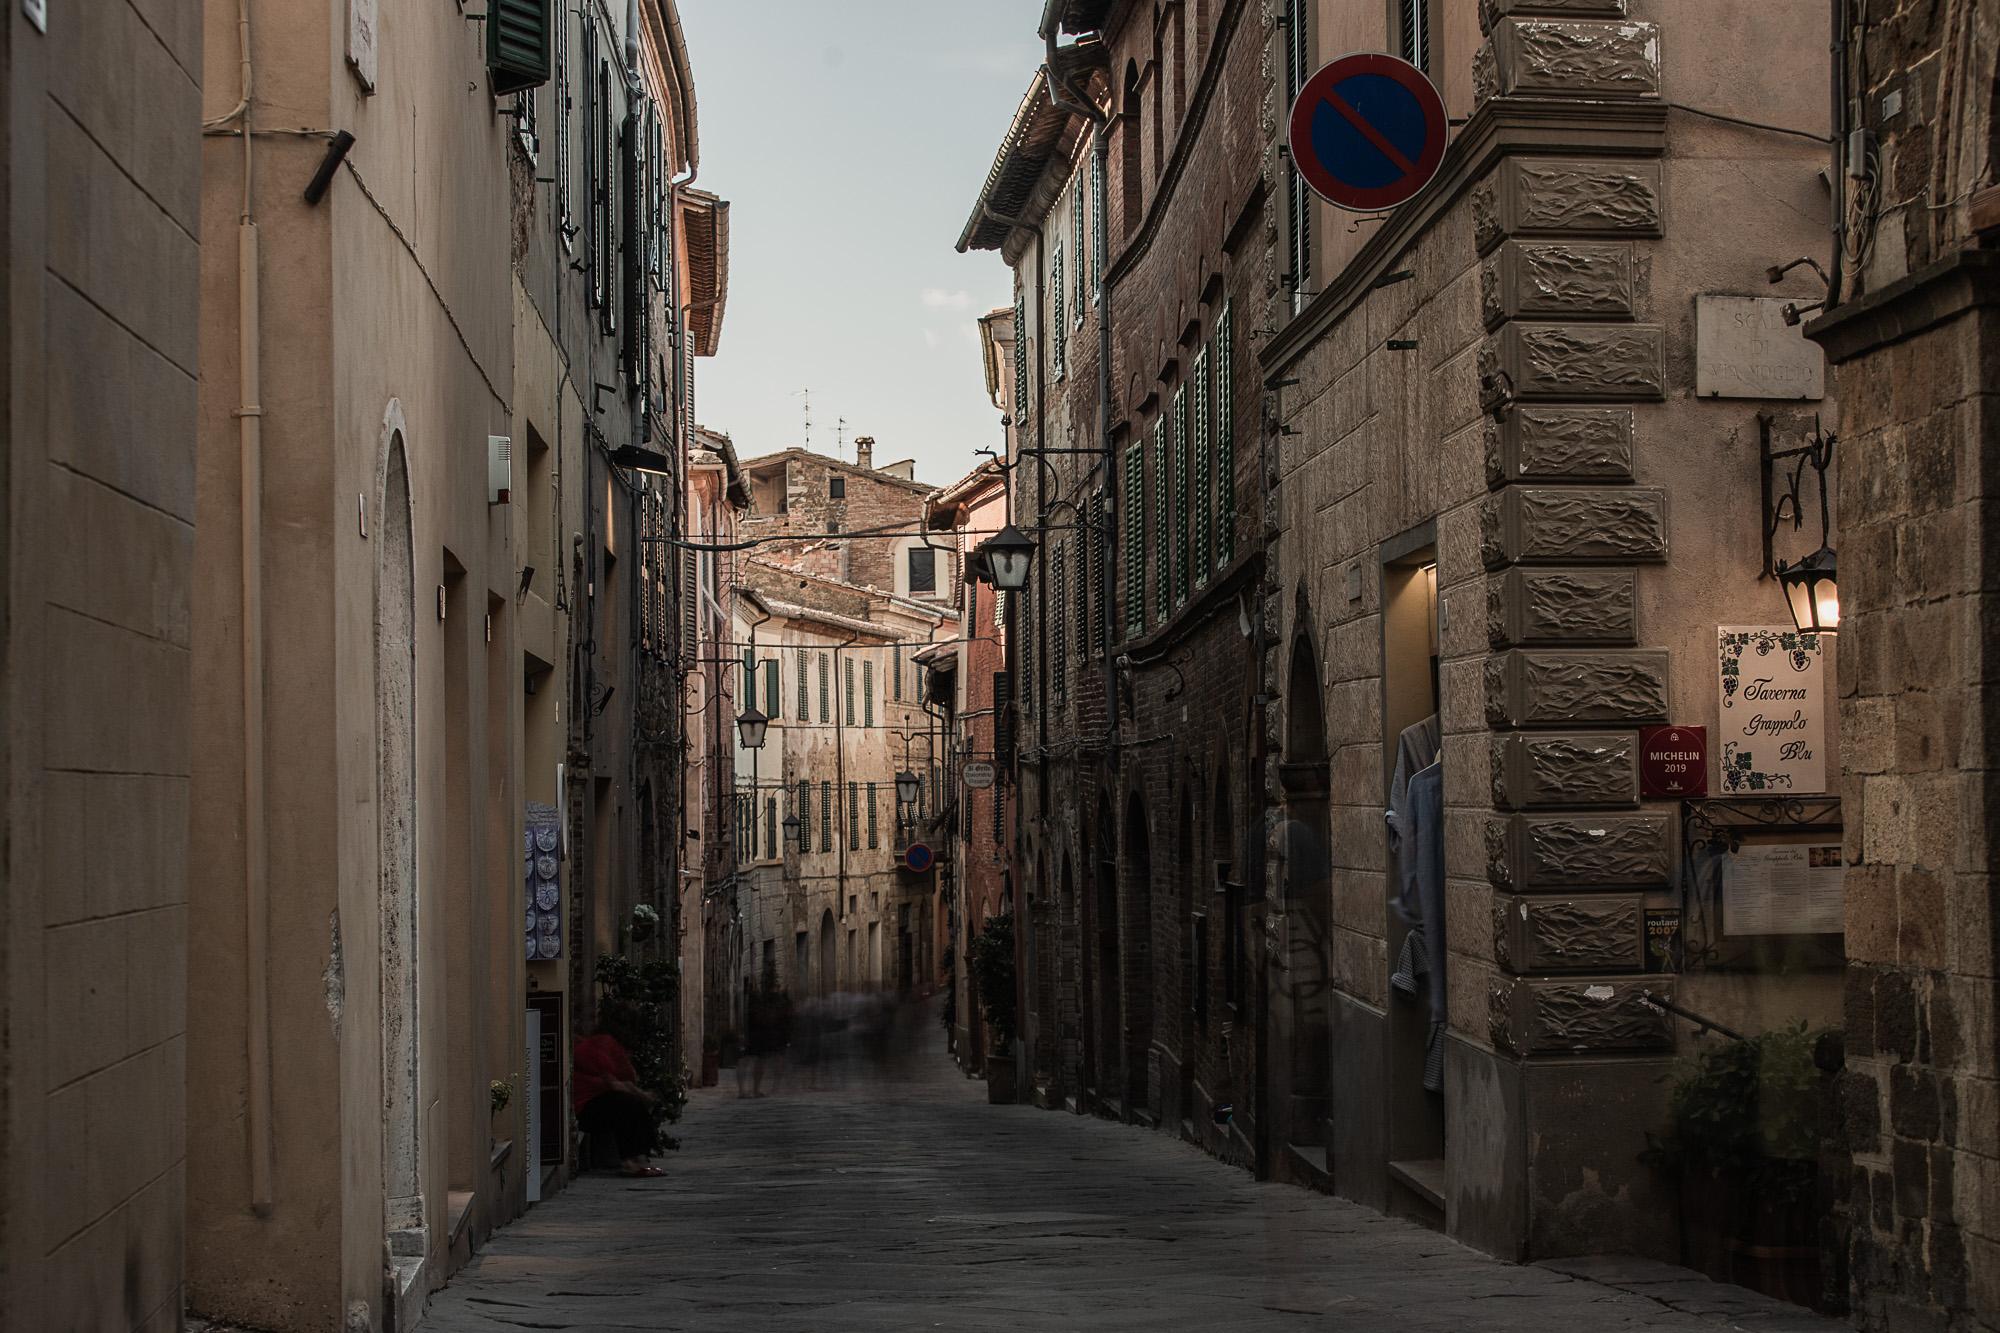 Via Giuseppe Mazzini, Italy